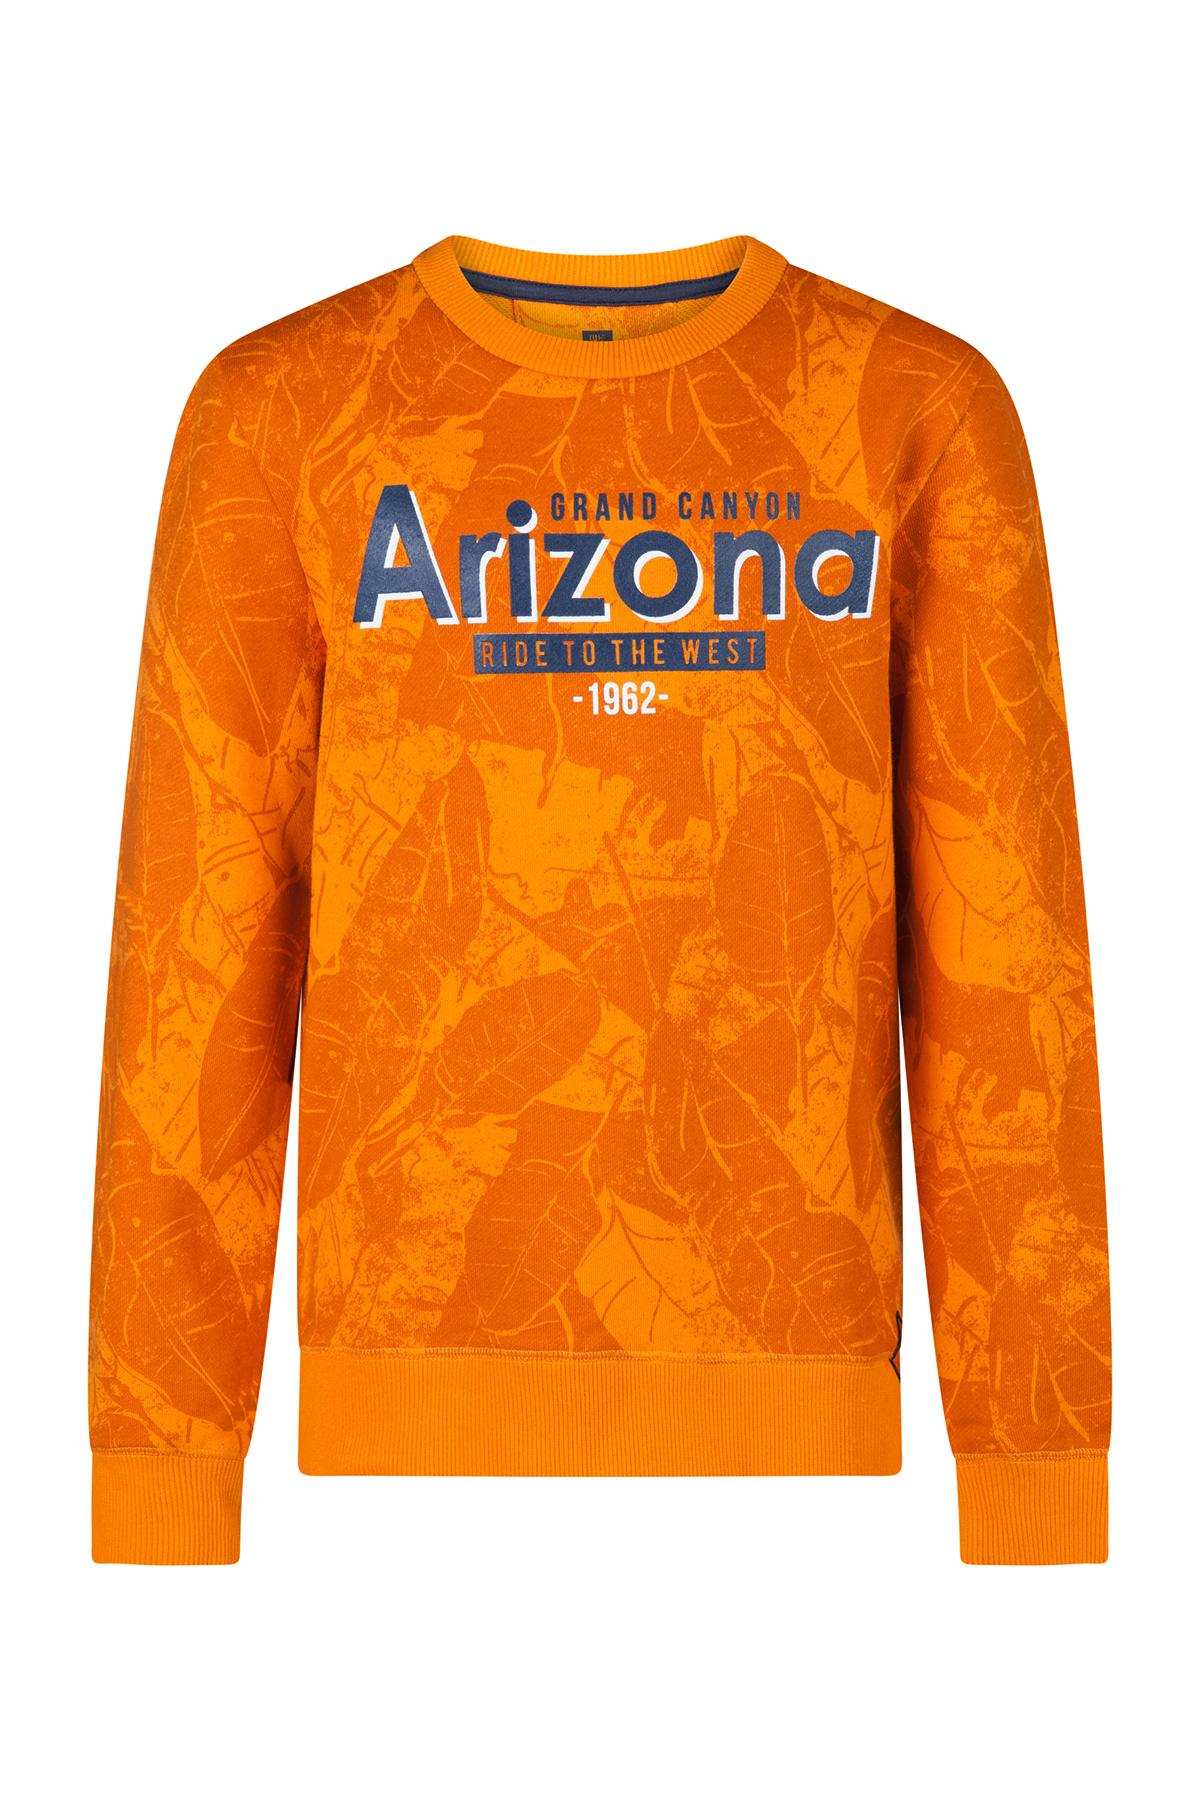 7472a5e72d7dd6 Jongens Arizona sweater | 94411164 - WE Fashion